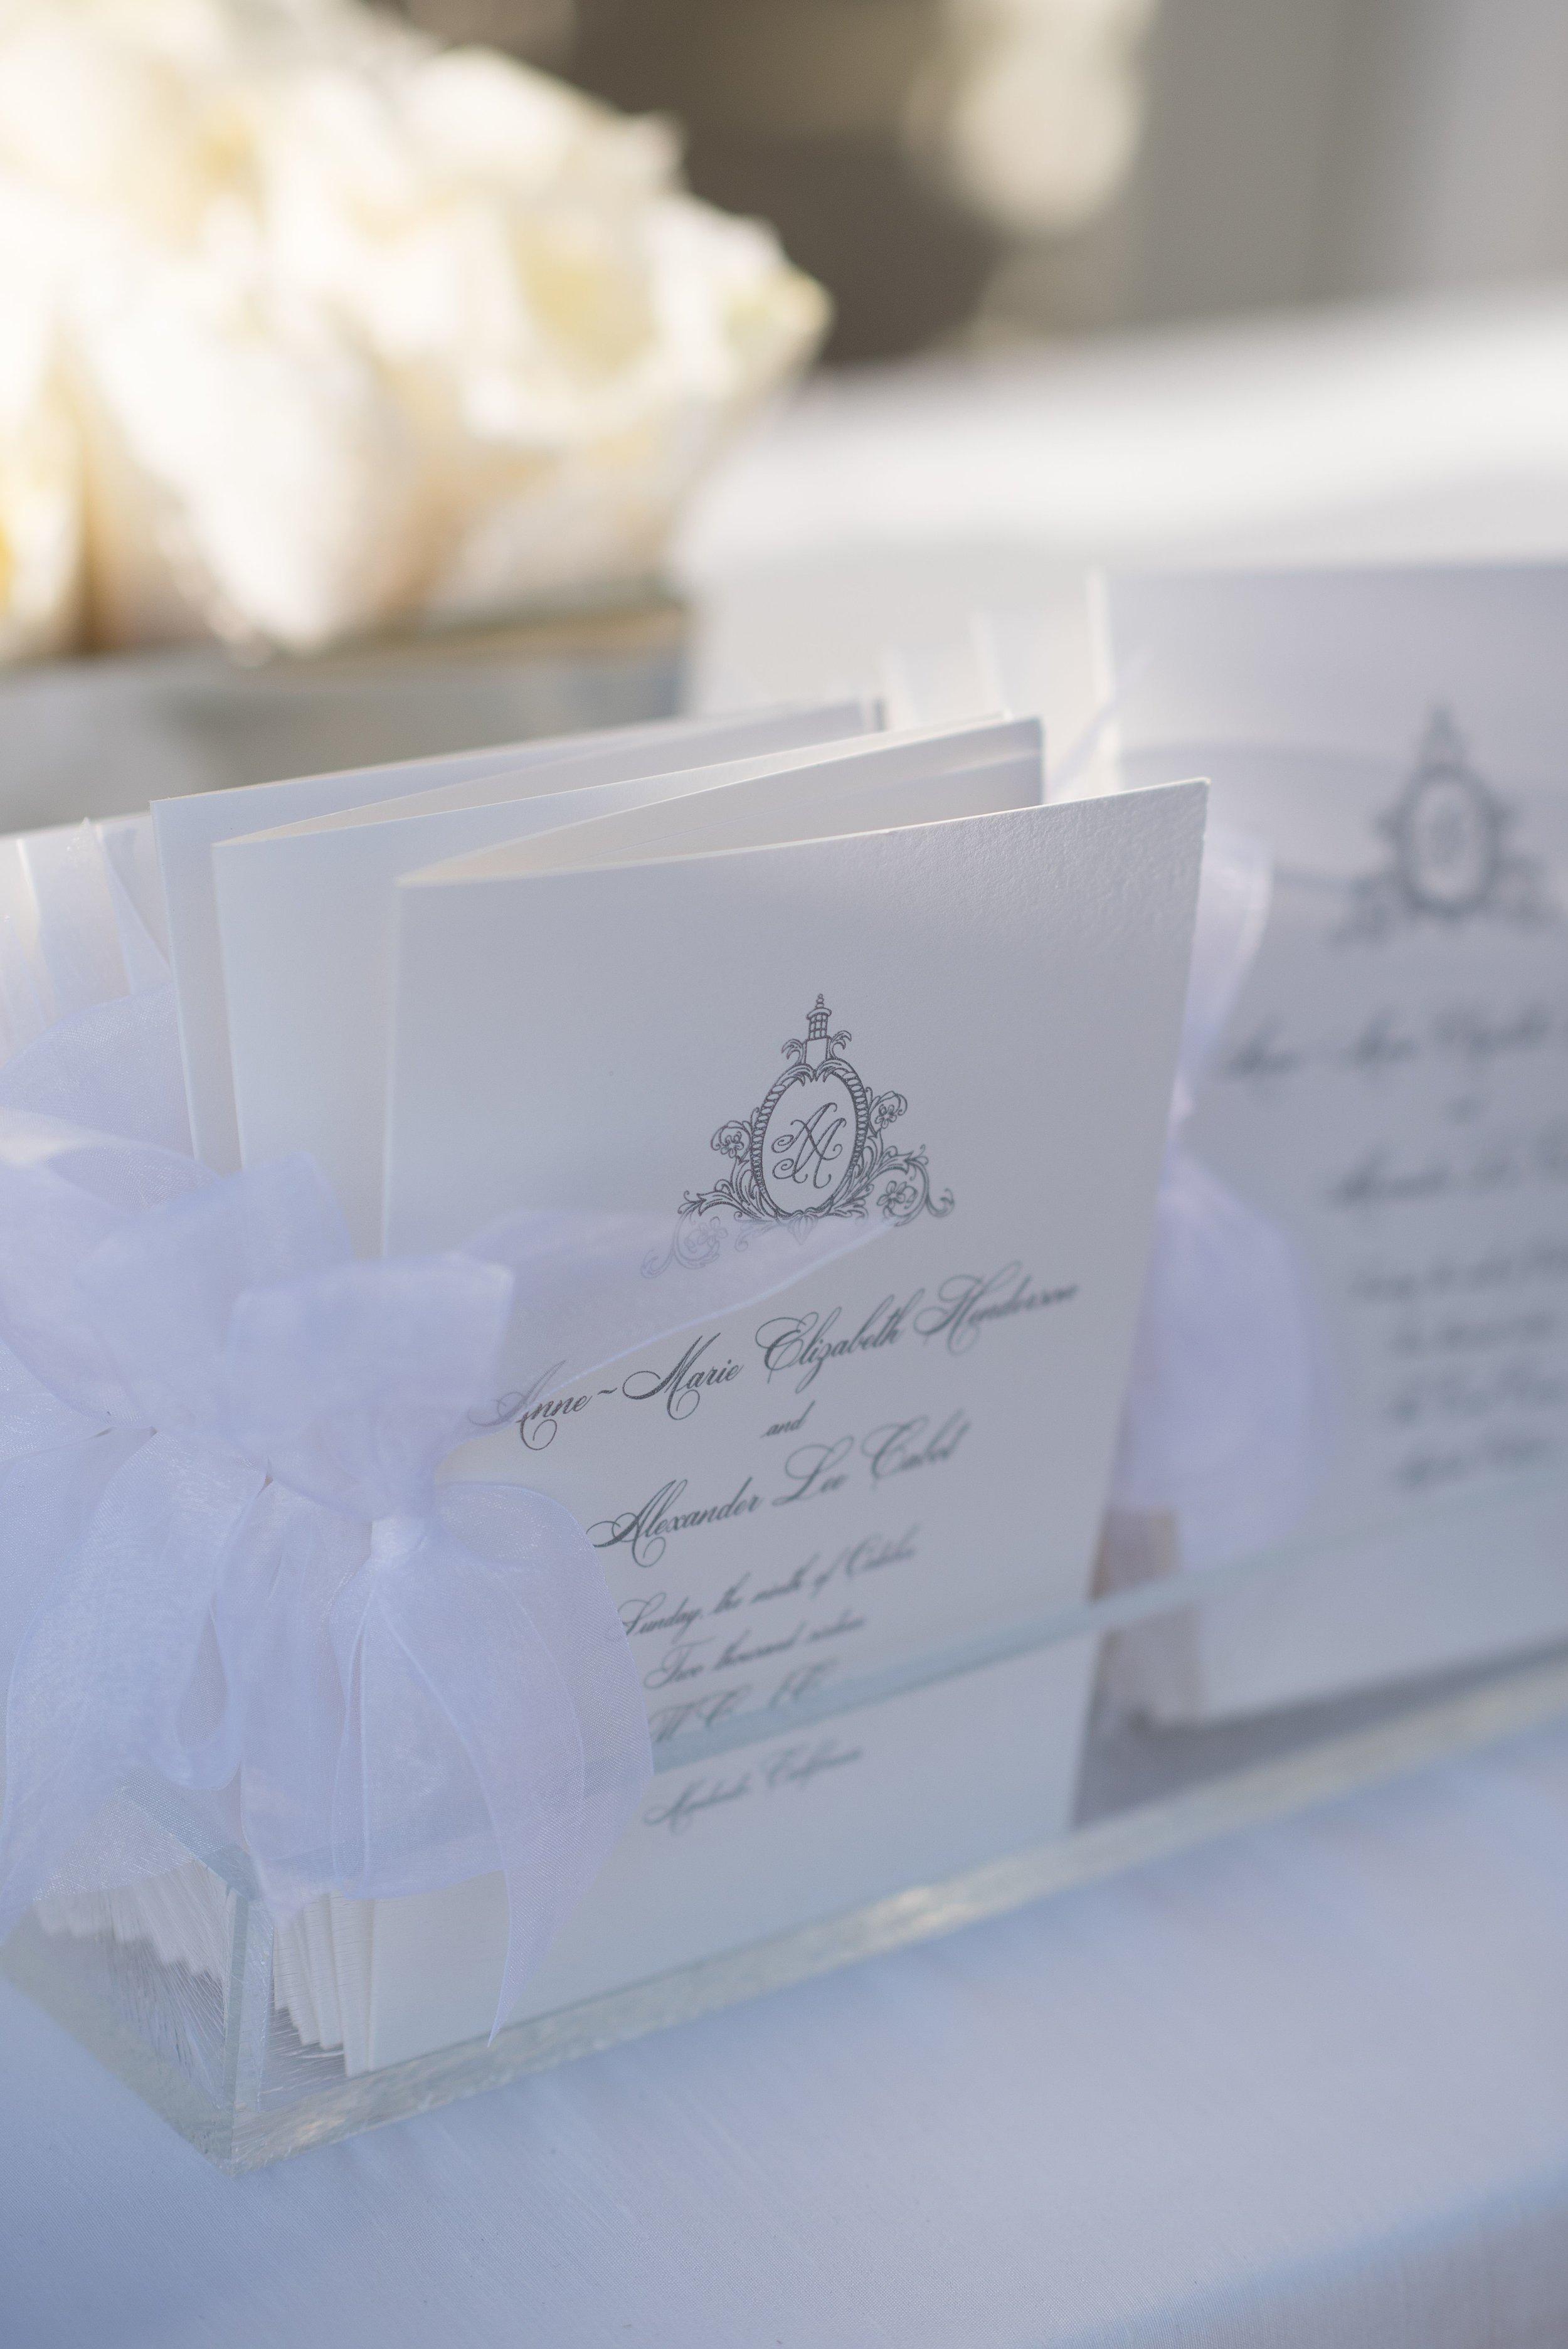 www.santabarbarawedding.com | Nate & Jenny Weddings | Four Seasons Resort The Biltmore | Ann Johnson Events | Florals by NICO | La Tavola | Wedding Ceremony Programs